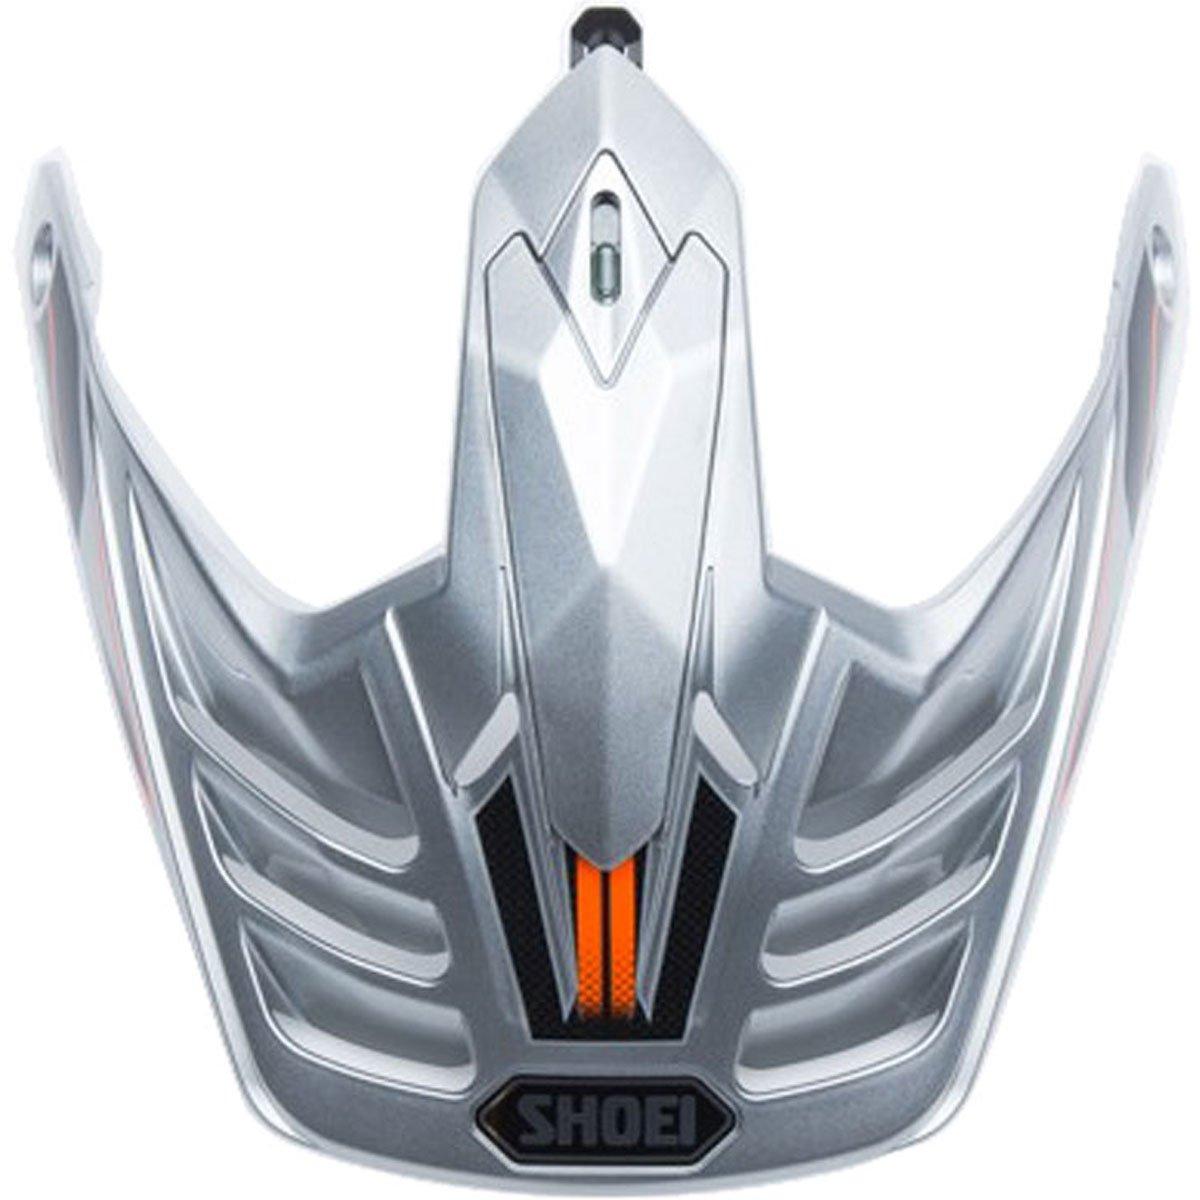 Shoei Hornet X2 Visor Seeker Off-Road Motorcycle Helmet Accessories - TC-8 / One Size